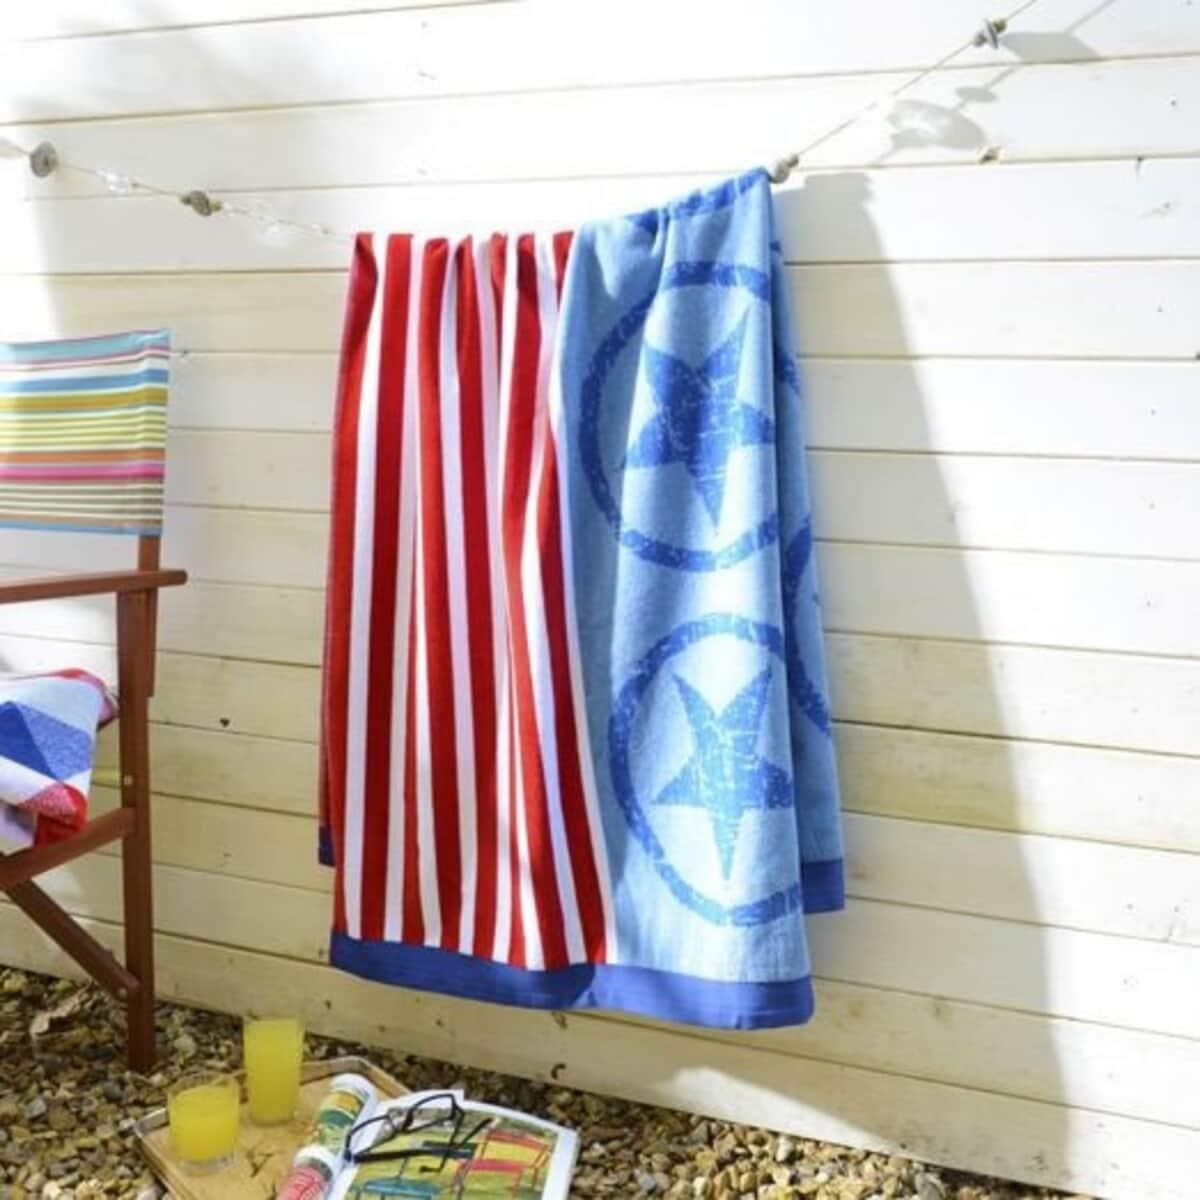 Deyongs Hudson Beach Towel large